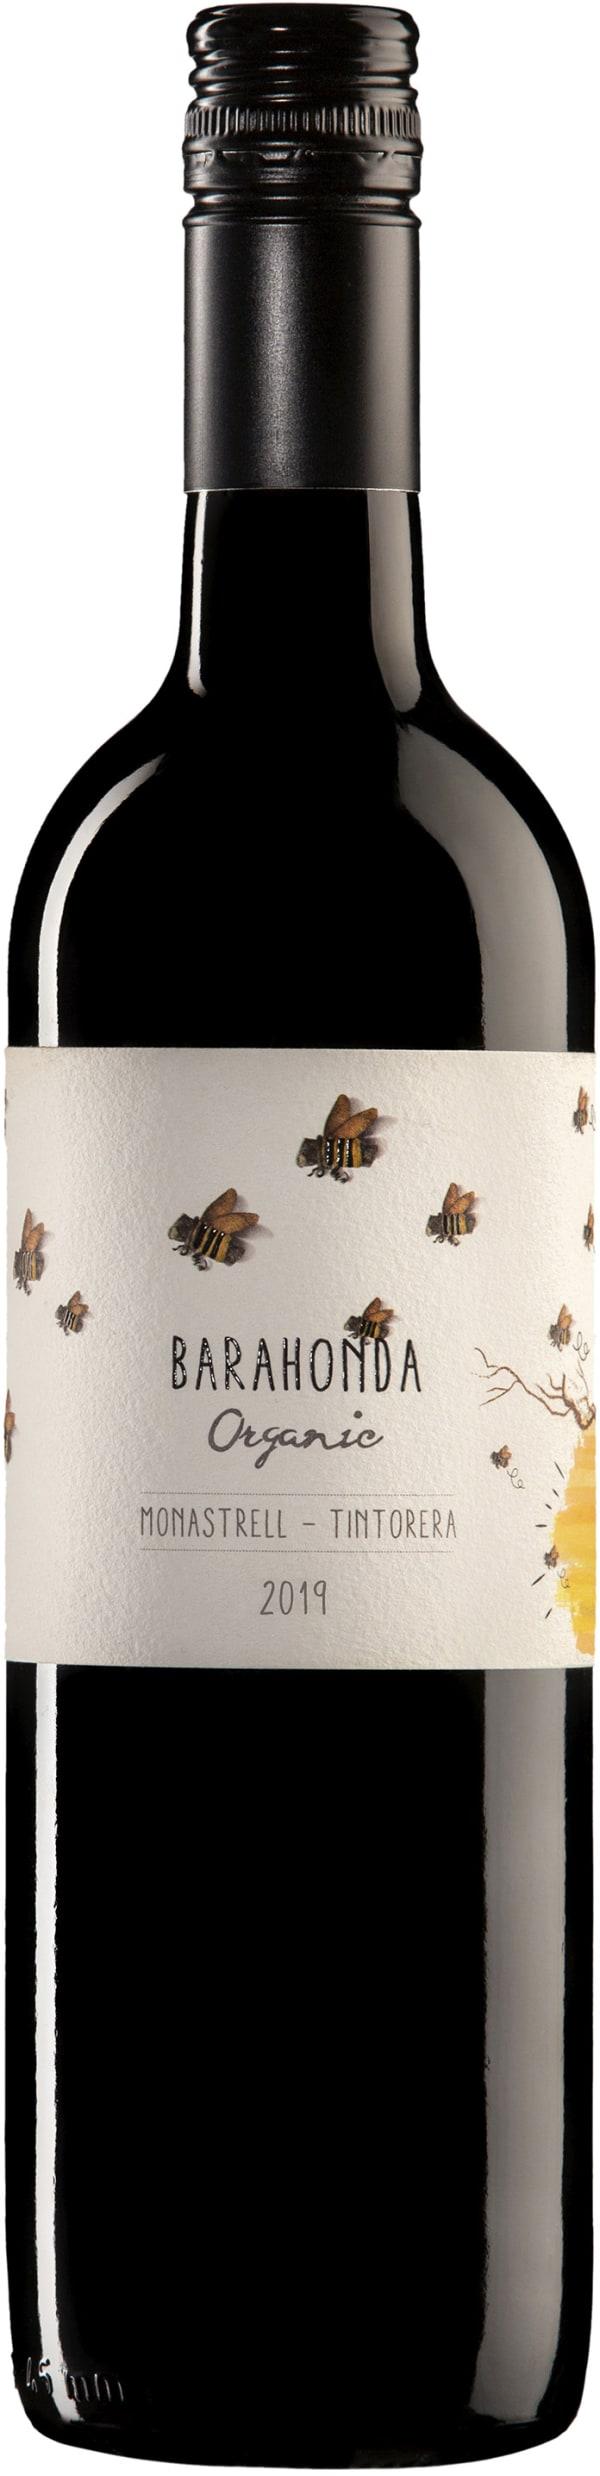 Barahonda Organic Monastrell Tintorera 2018